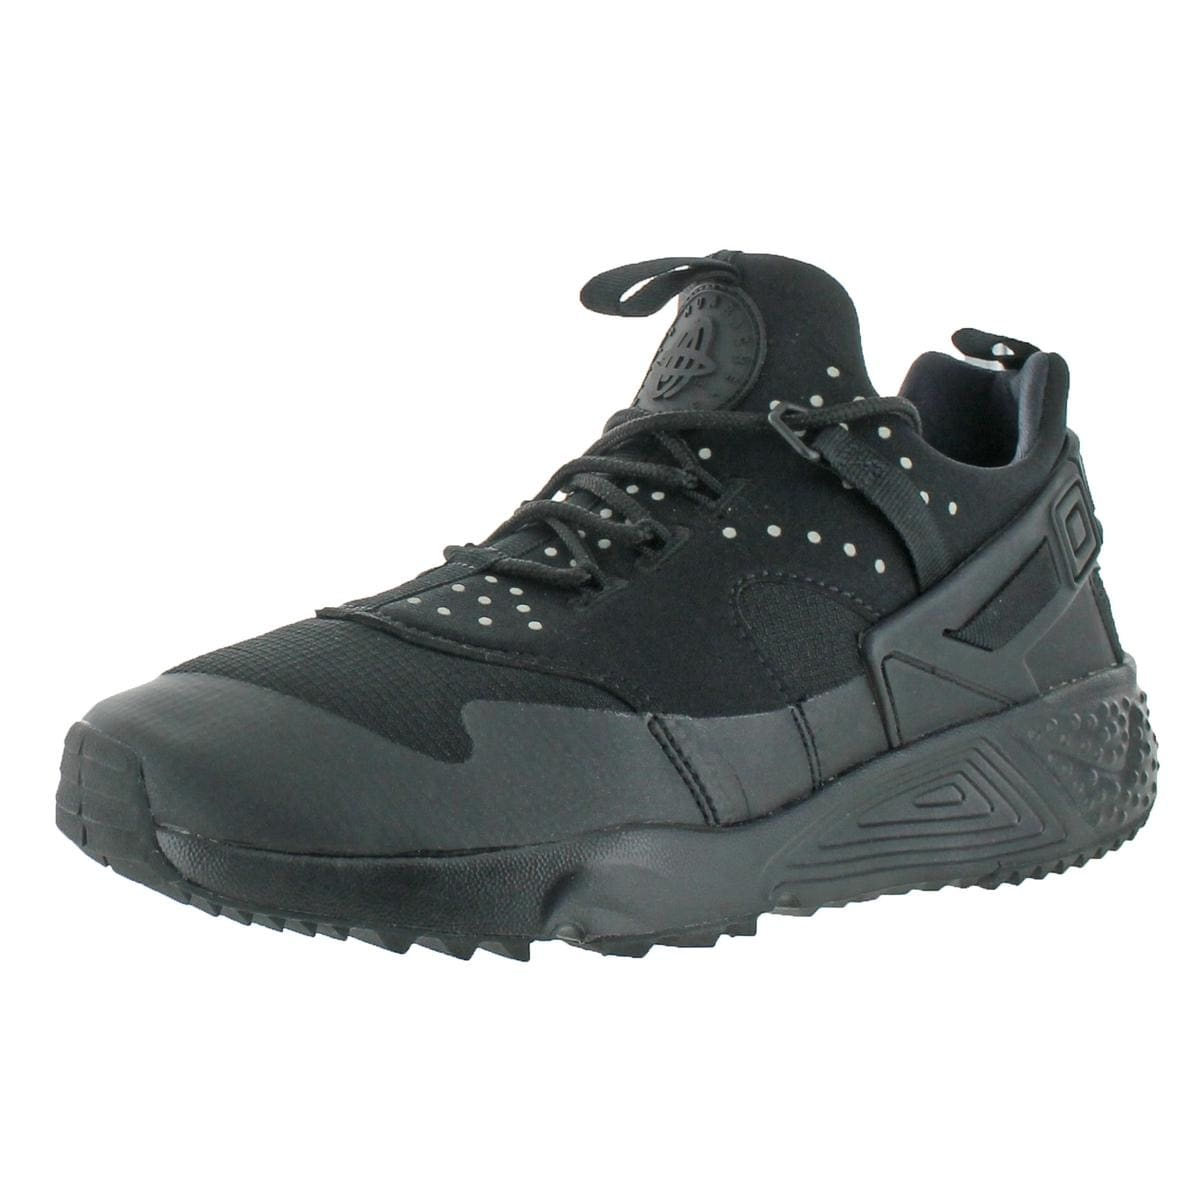 5936a87c201c Shop Nike Mens Air Huarache Utility Running Shoes Pattern Training ...